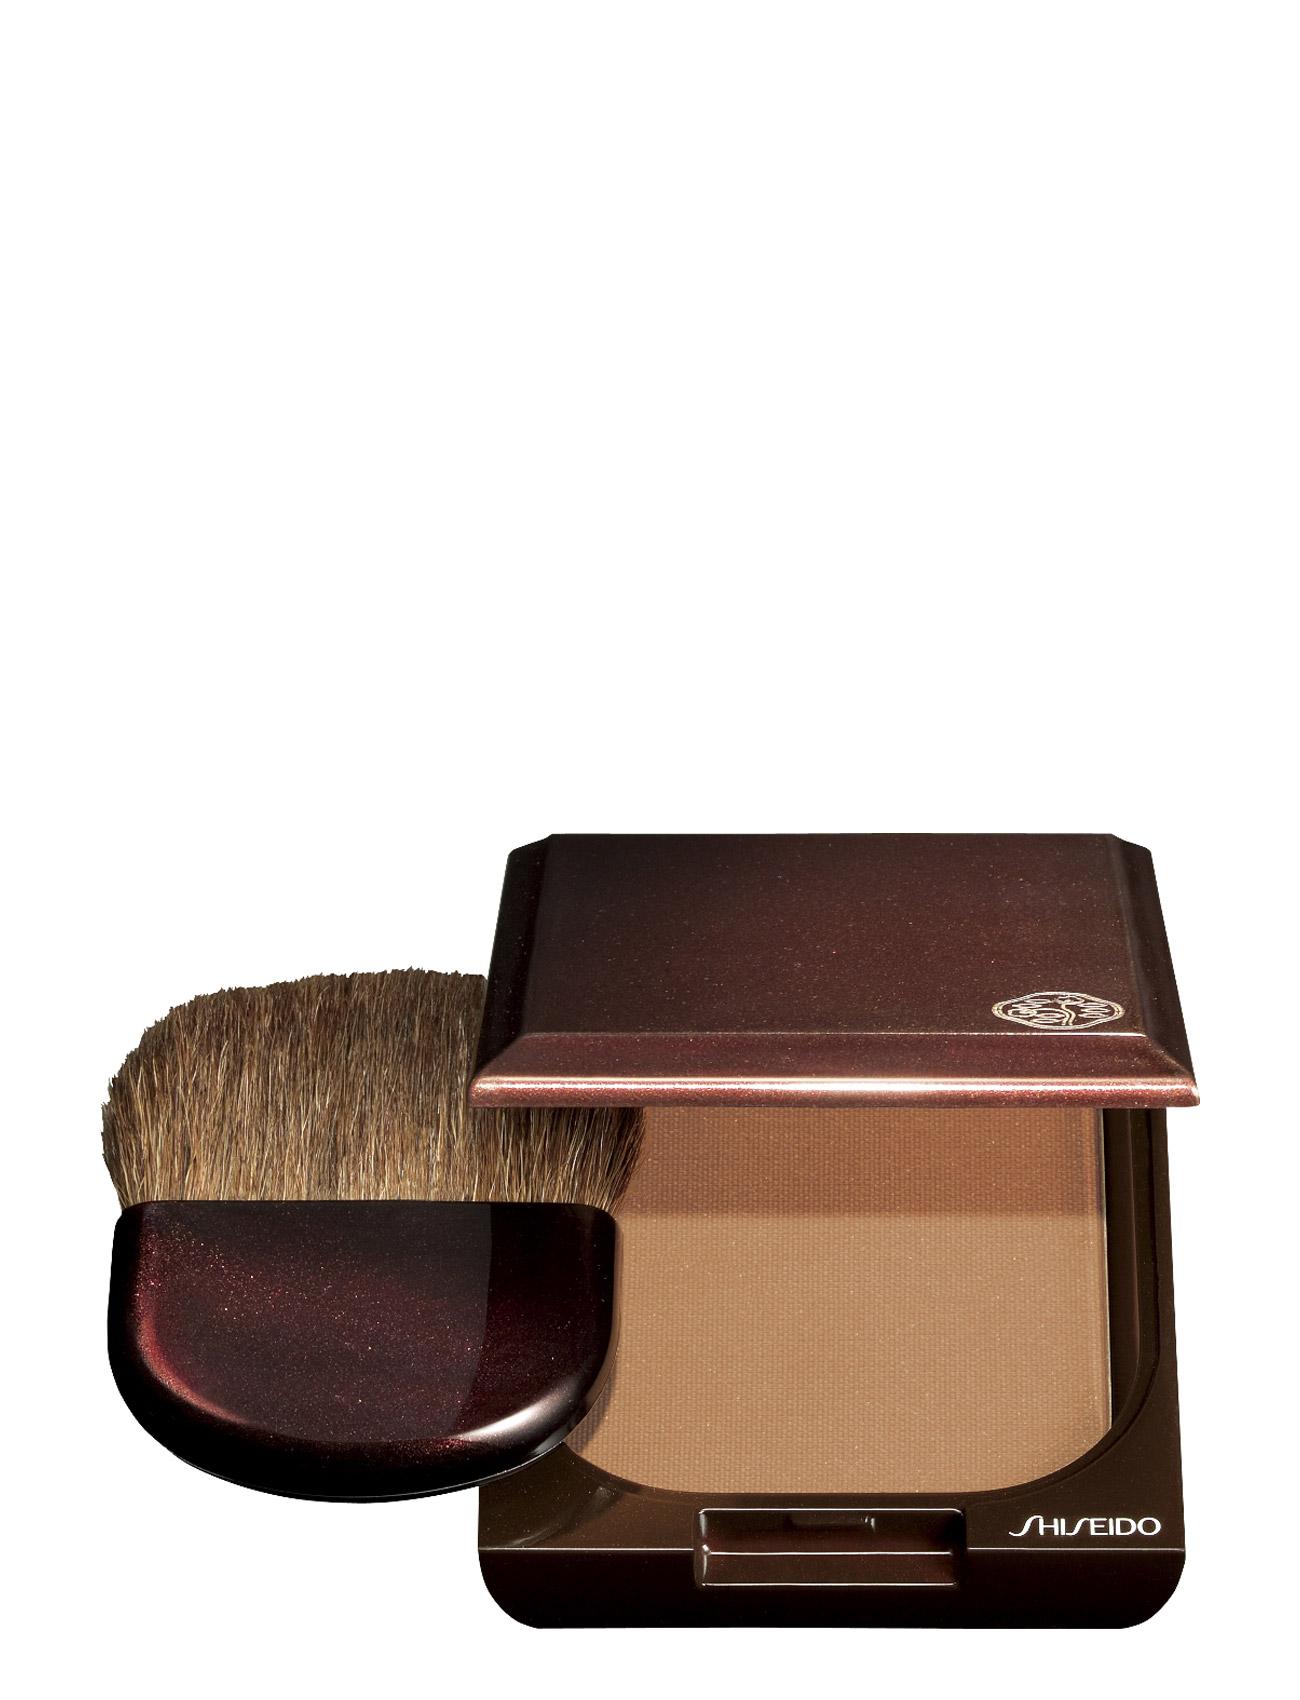 shiseido Shiseido bronzer dark på boozt.com dk